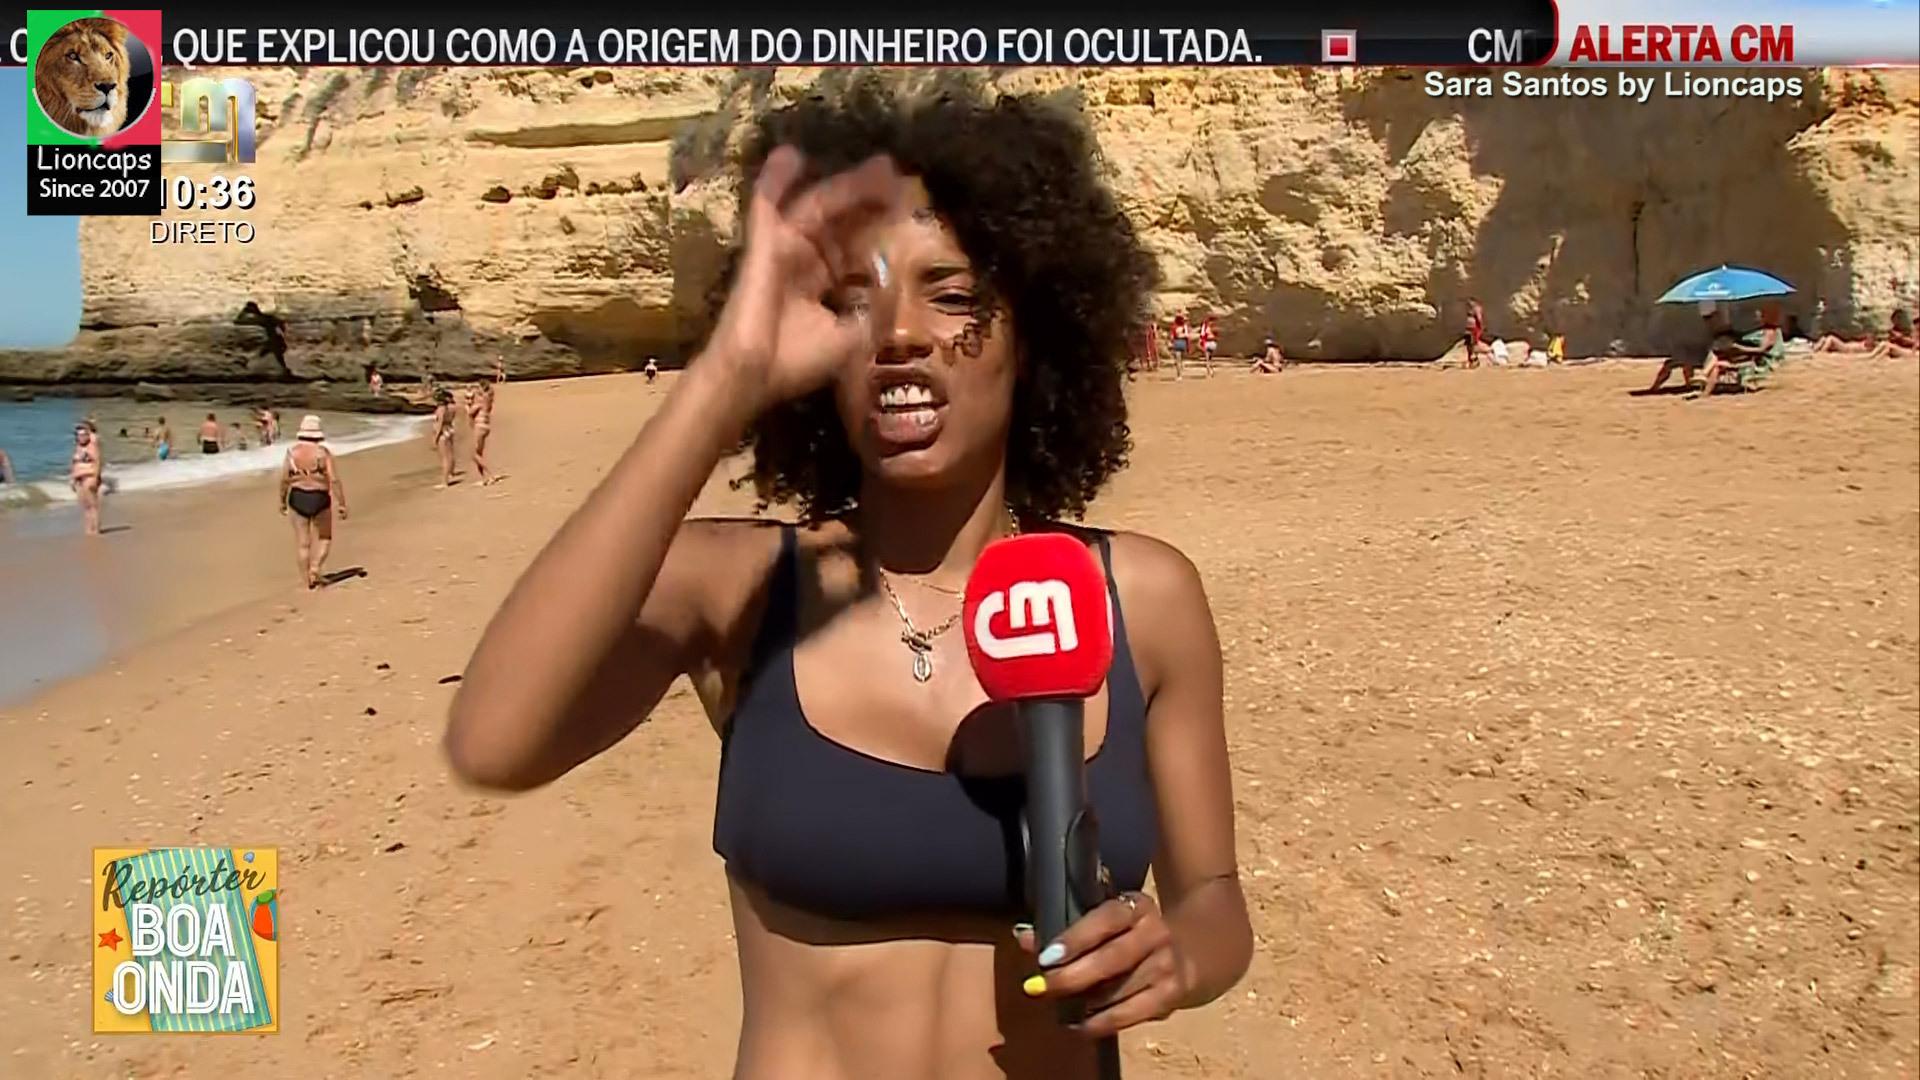 sara_santos_praia_lioncaps_24_07_2021_02 (2).jpg